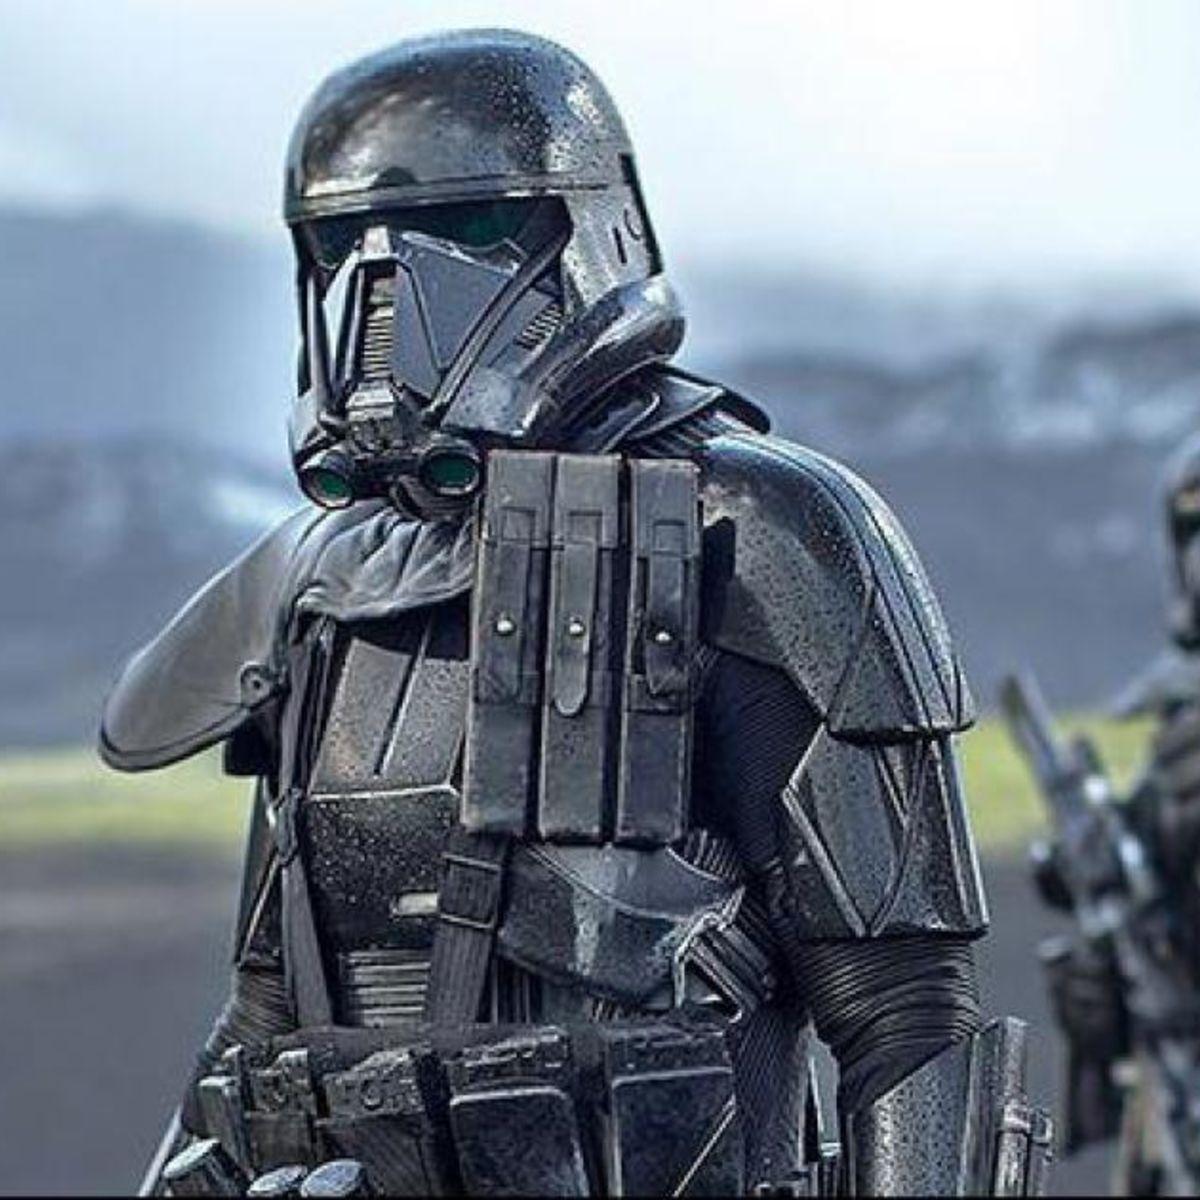 rogue-one-death-trooper-stormtrooper-a-star.jpg